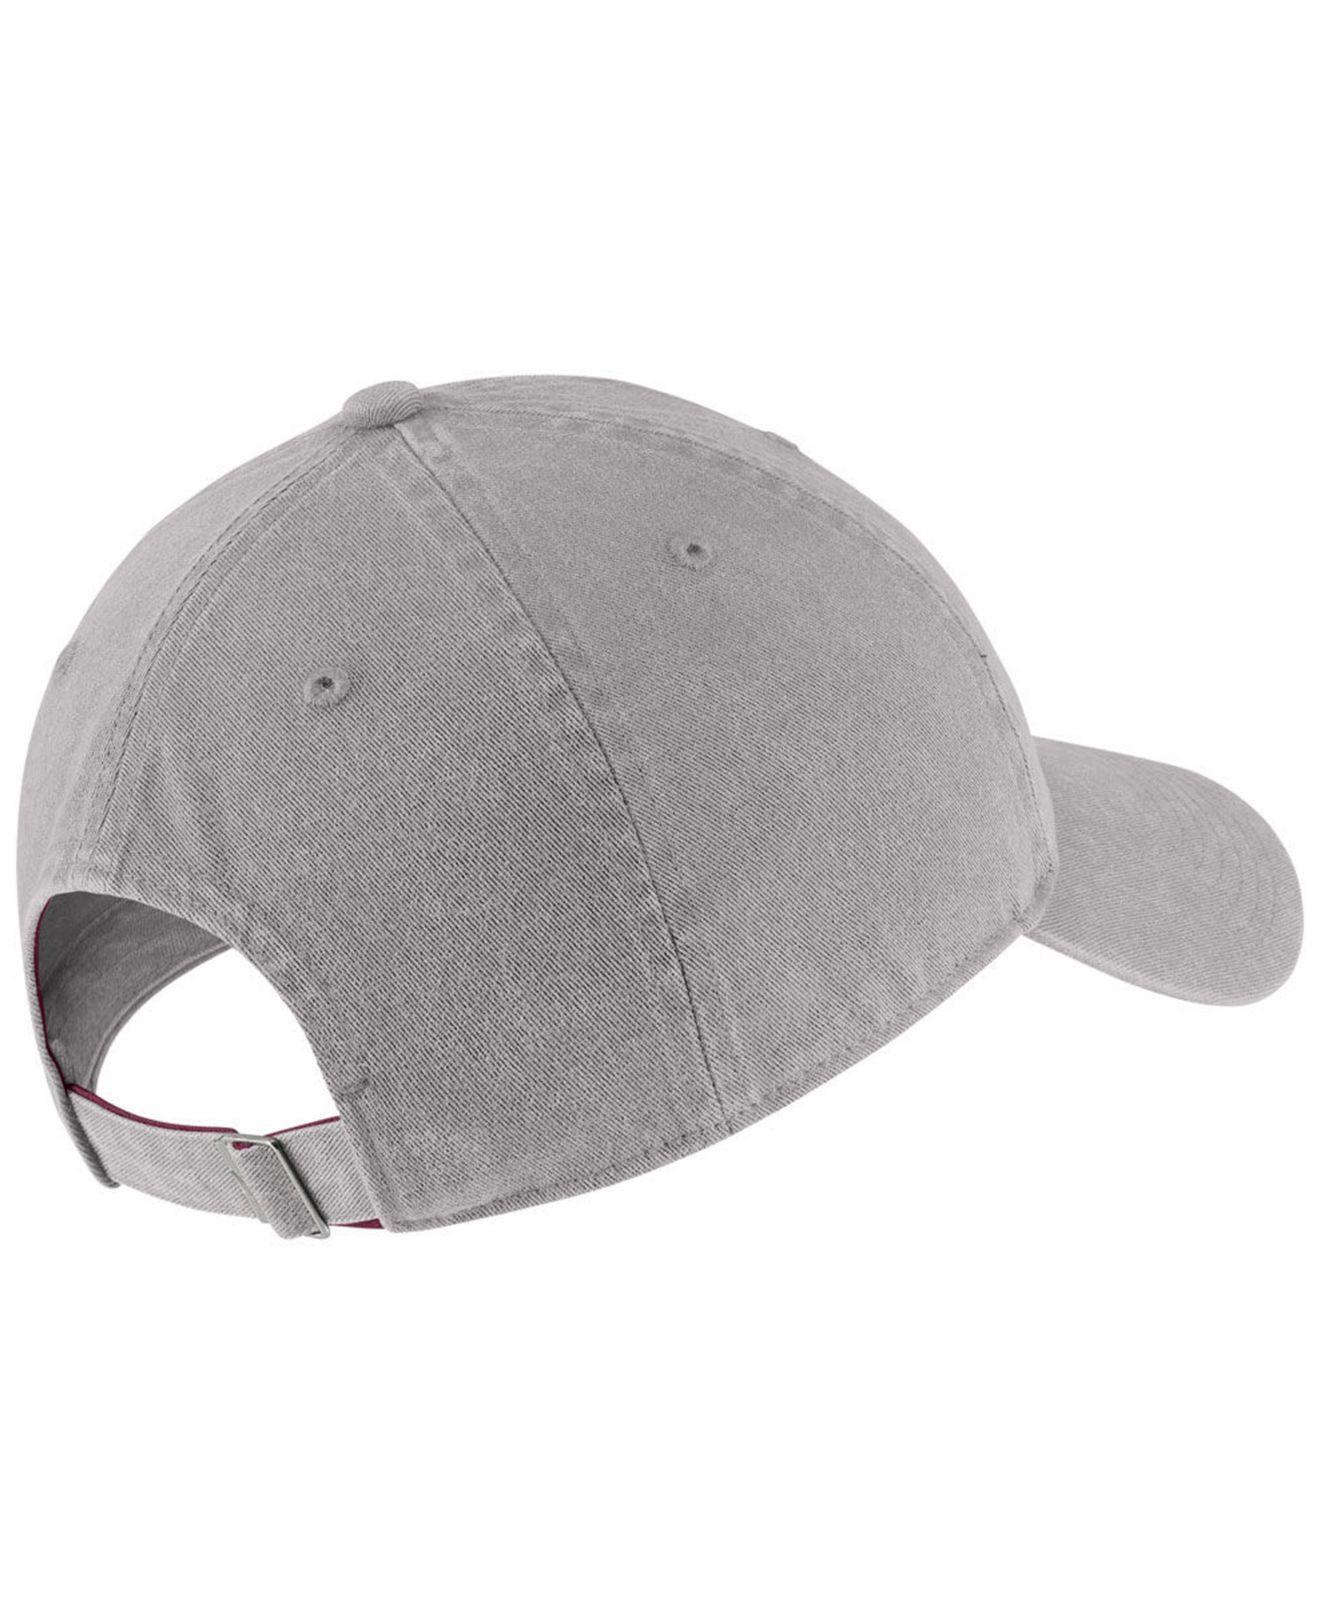 buy popular 53b26 2d1bd Lyst - Nike Florida State Seminoles H86 Washed Strapback Cap in Gray for Men